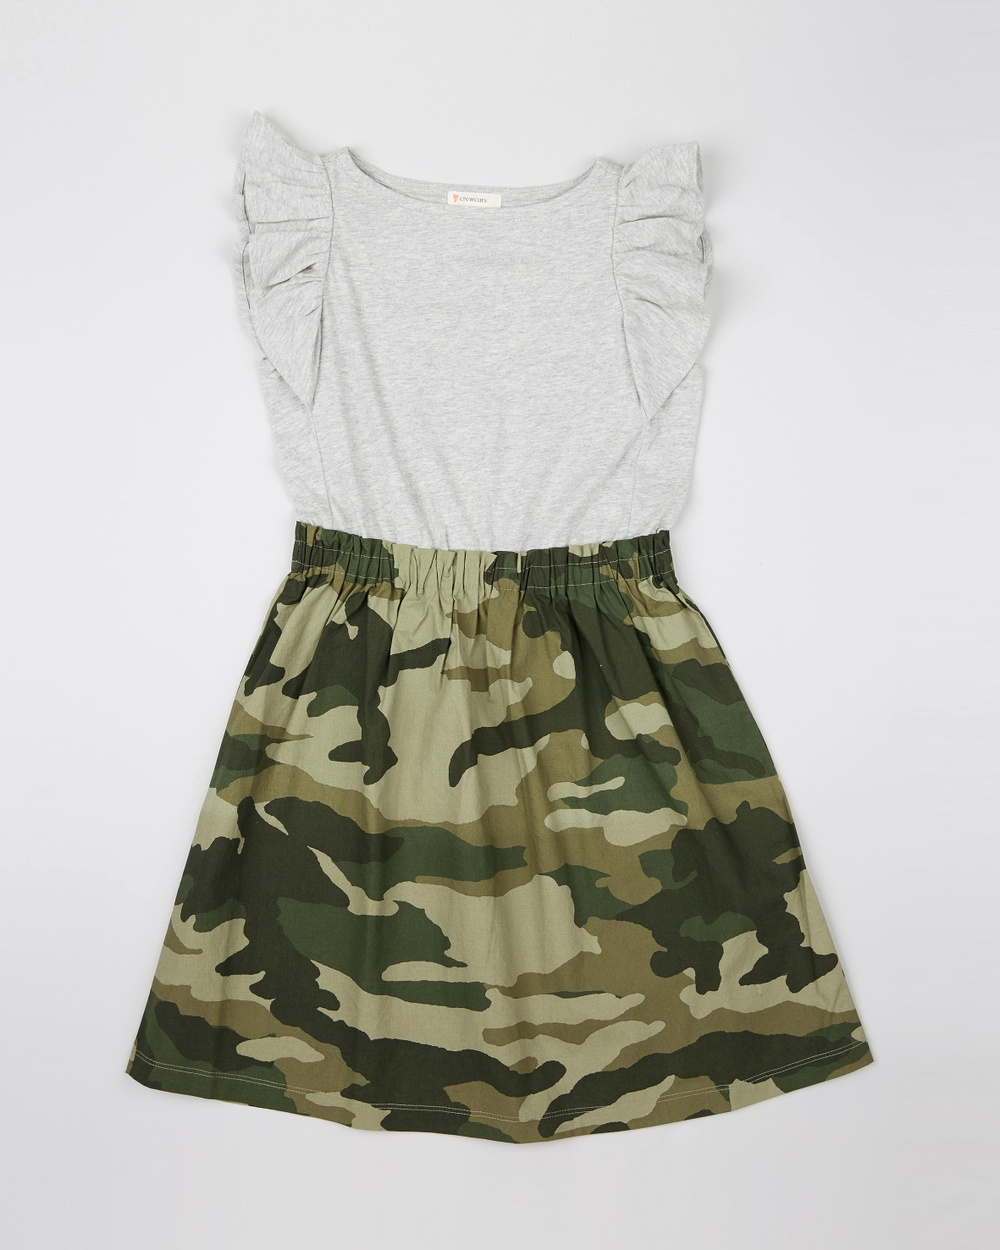 crewcuts by J Crew Heather Dusk Camo Ella Knit Woven Dress – Teens